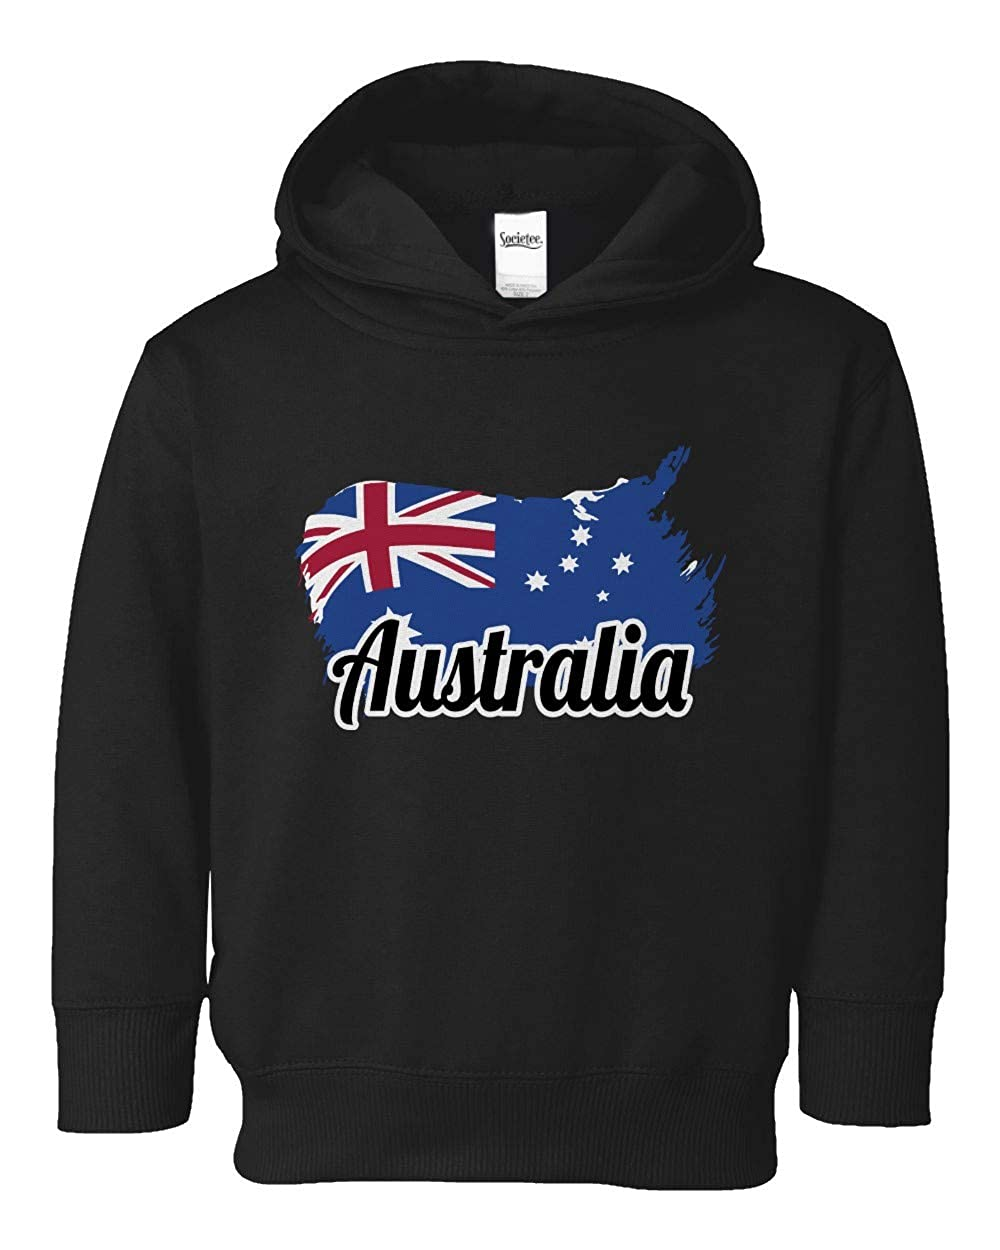 Societee Australia National Pride Cute Adorable Girls Boys Toddler Hooded Sweatshirt